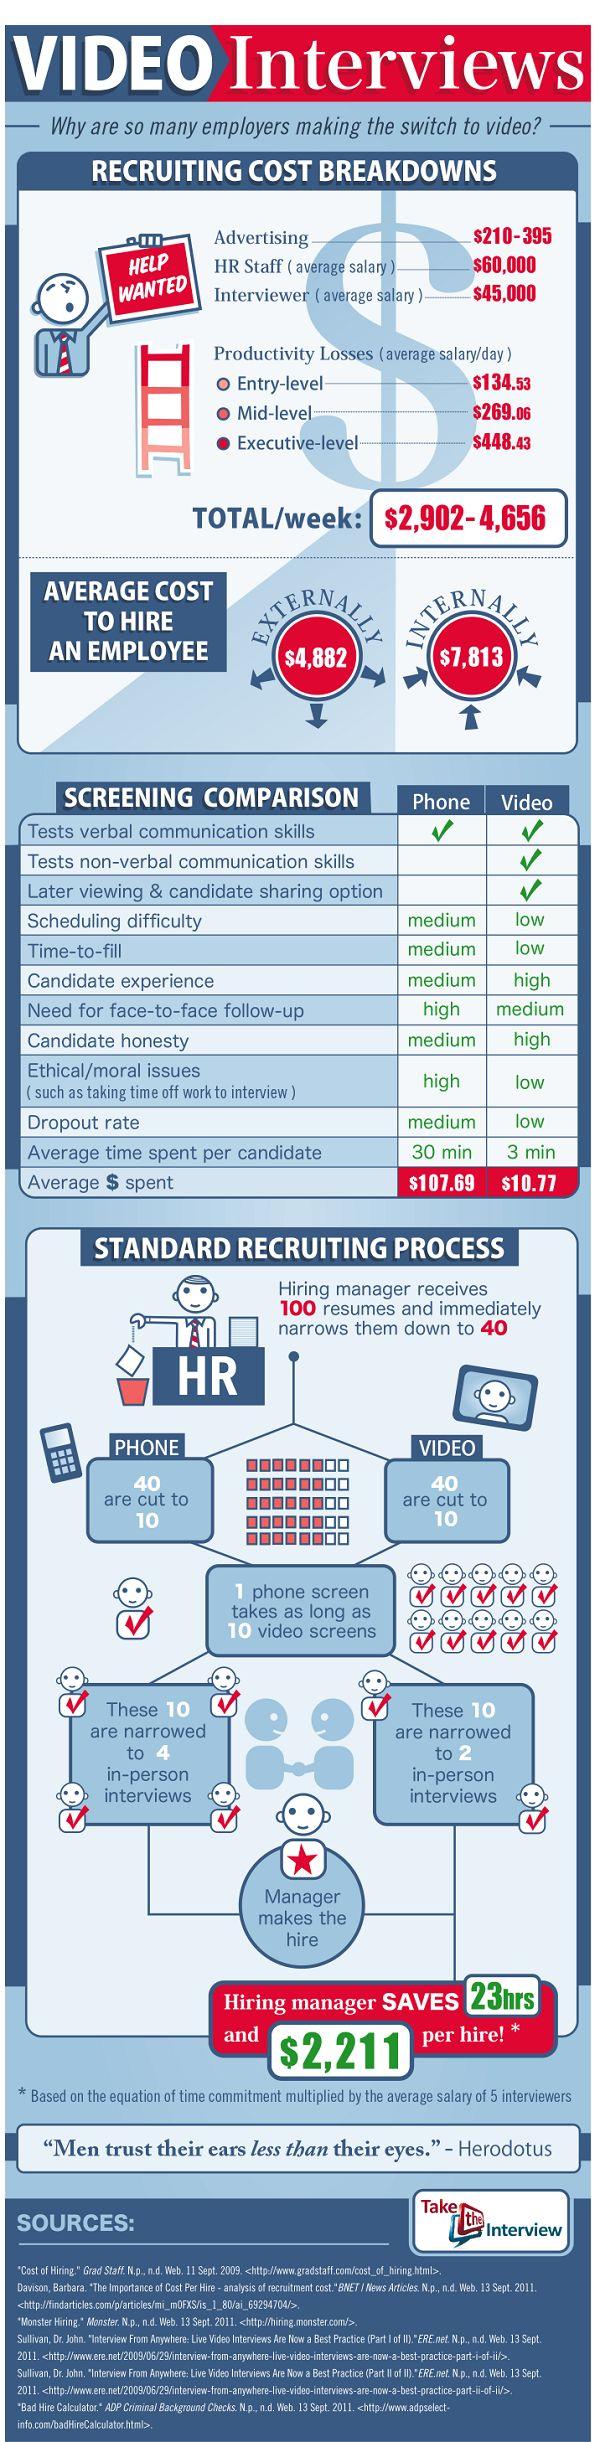 Video Interview #Recruiting Cost Breakdown infographic #talentnet